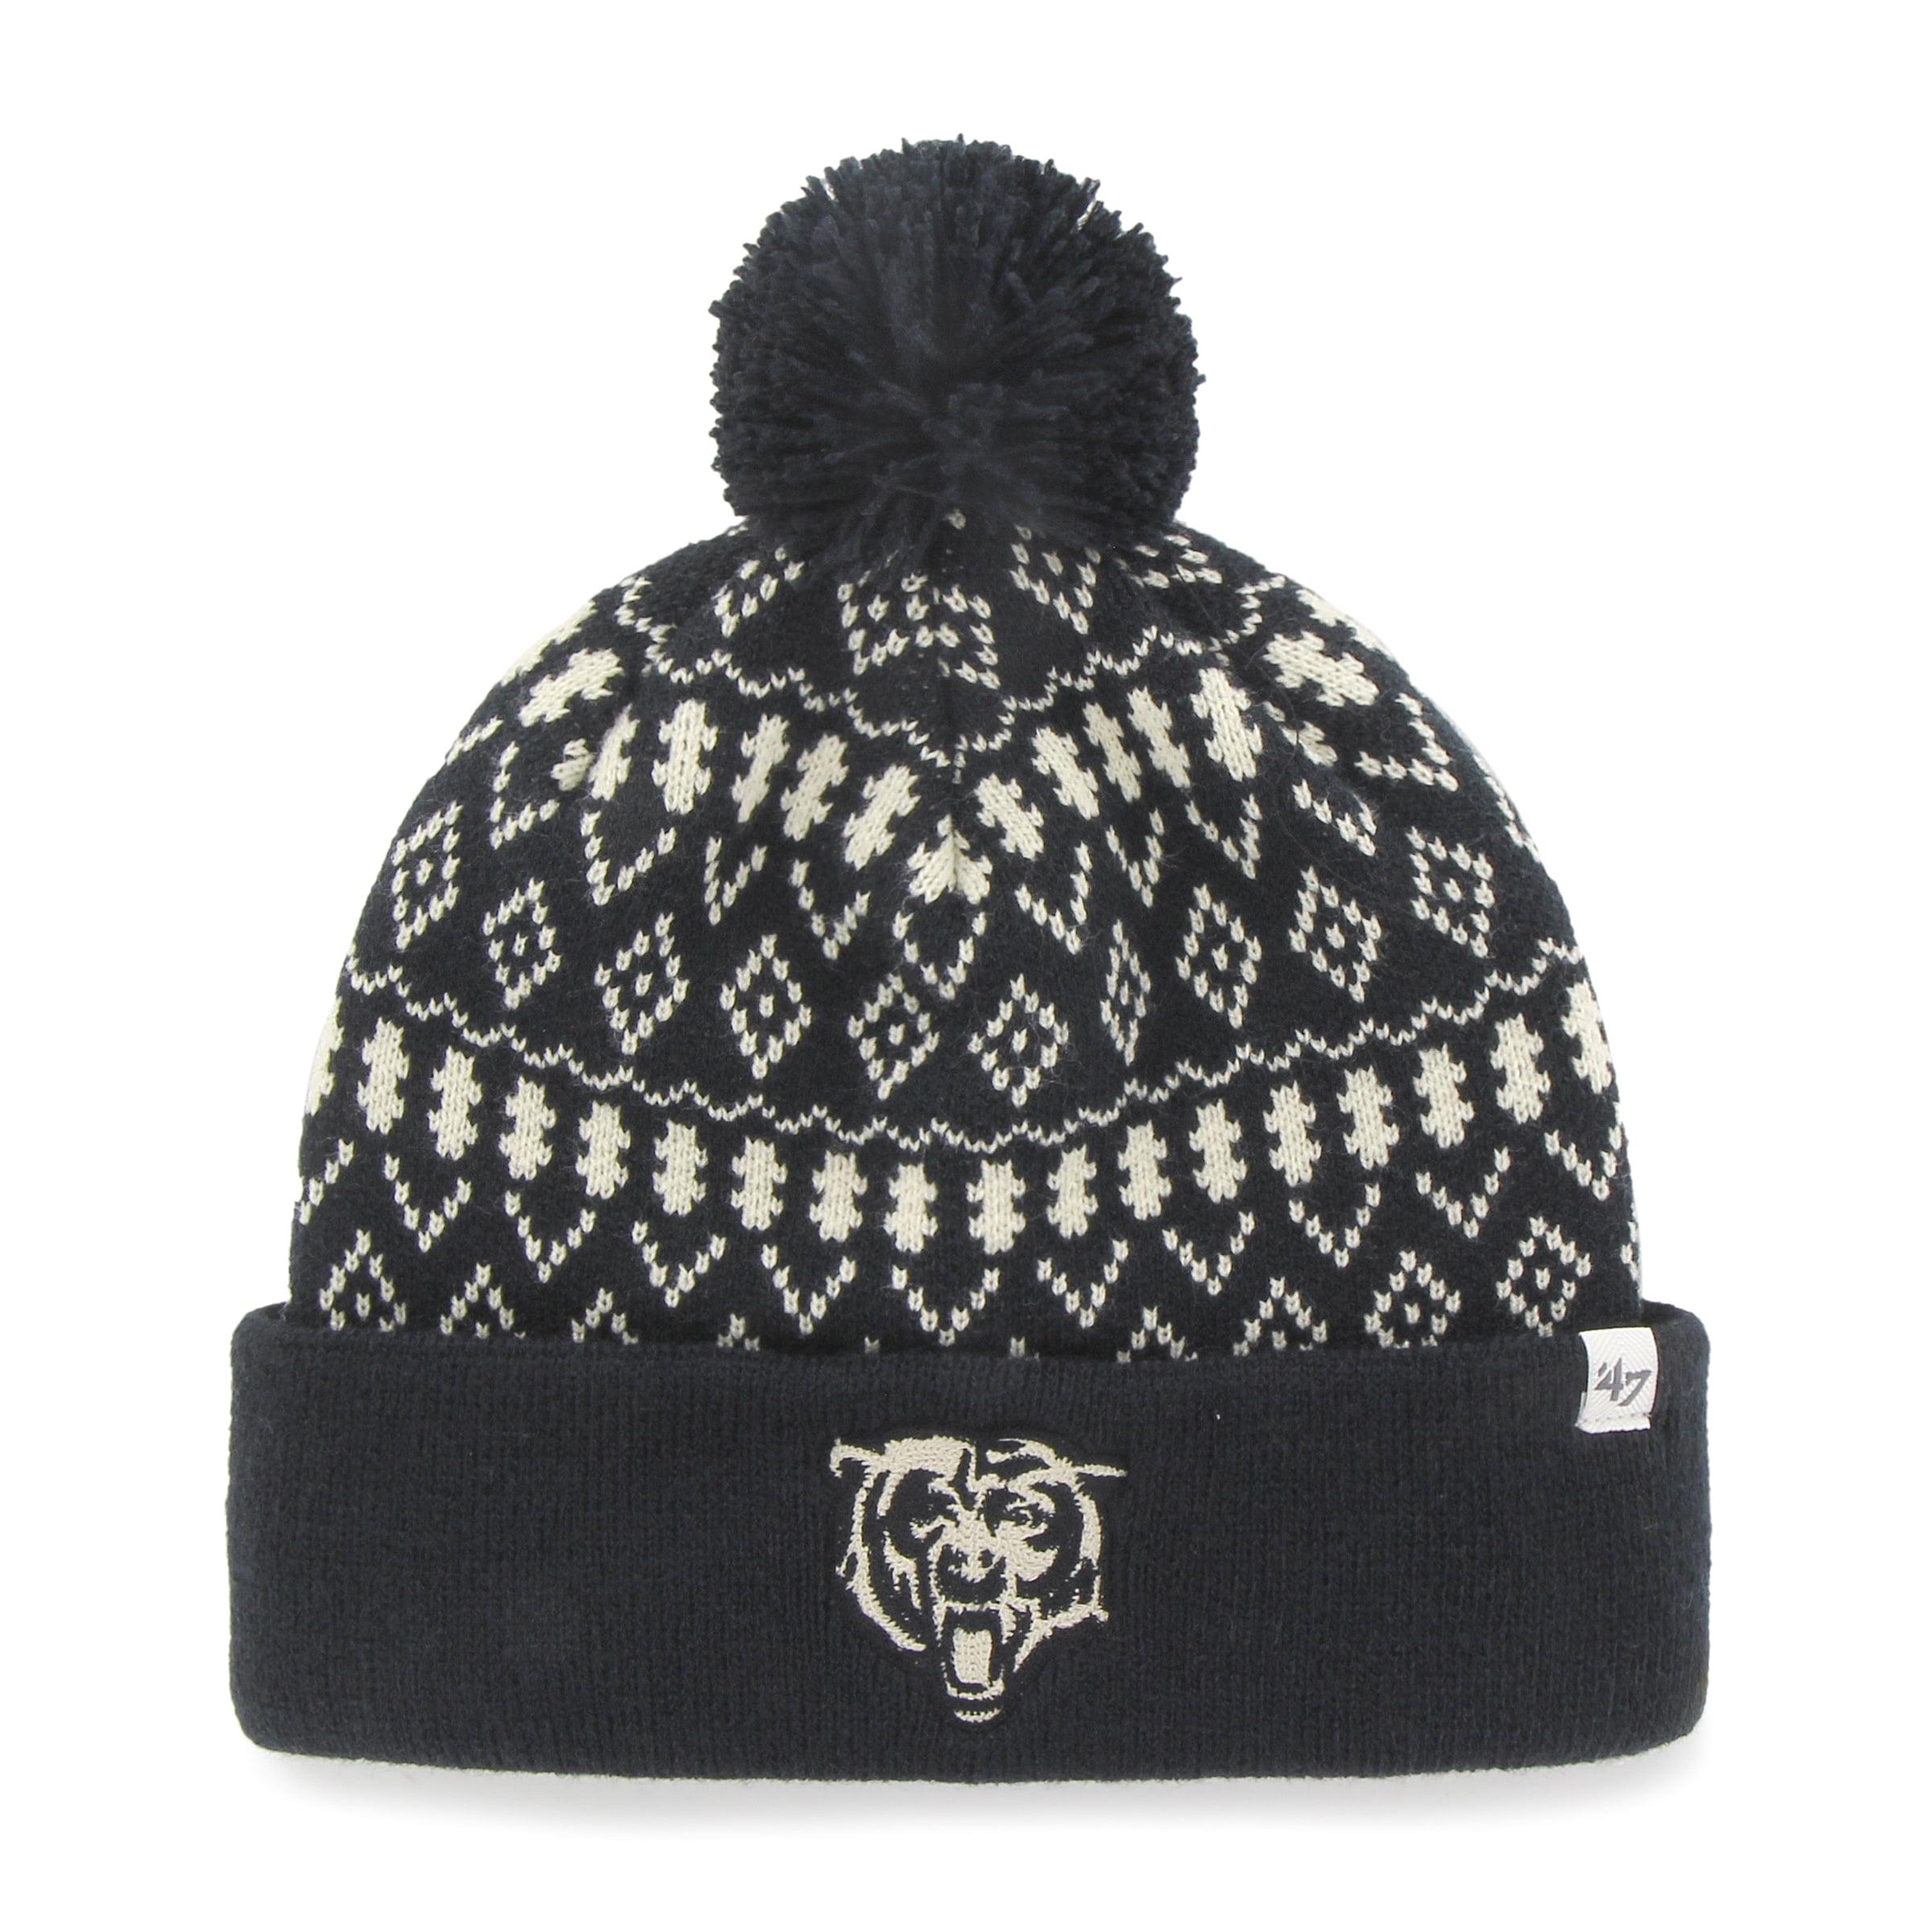 Chicago Bears Eileen Women's Navy Cuffed Knit Hat by 47 Brand